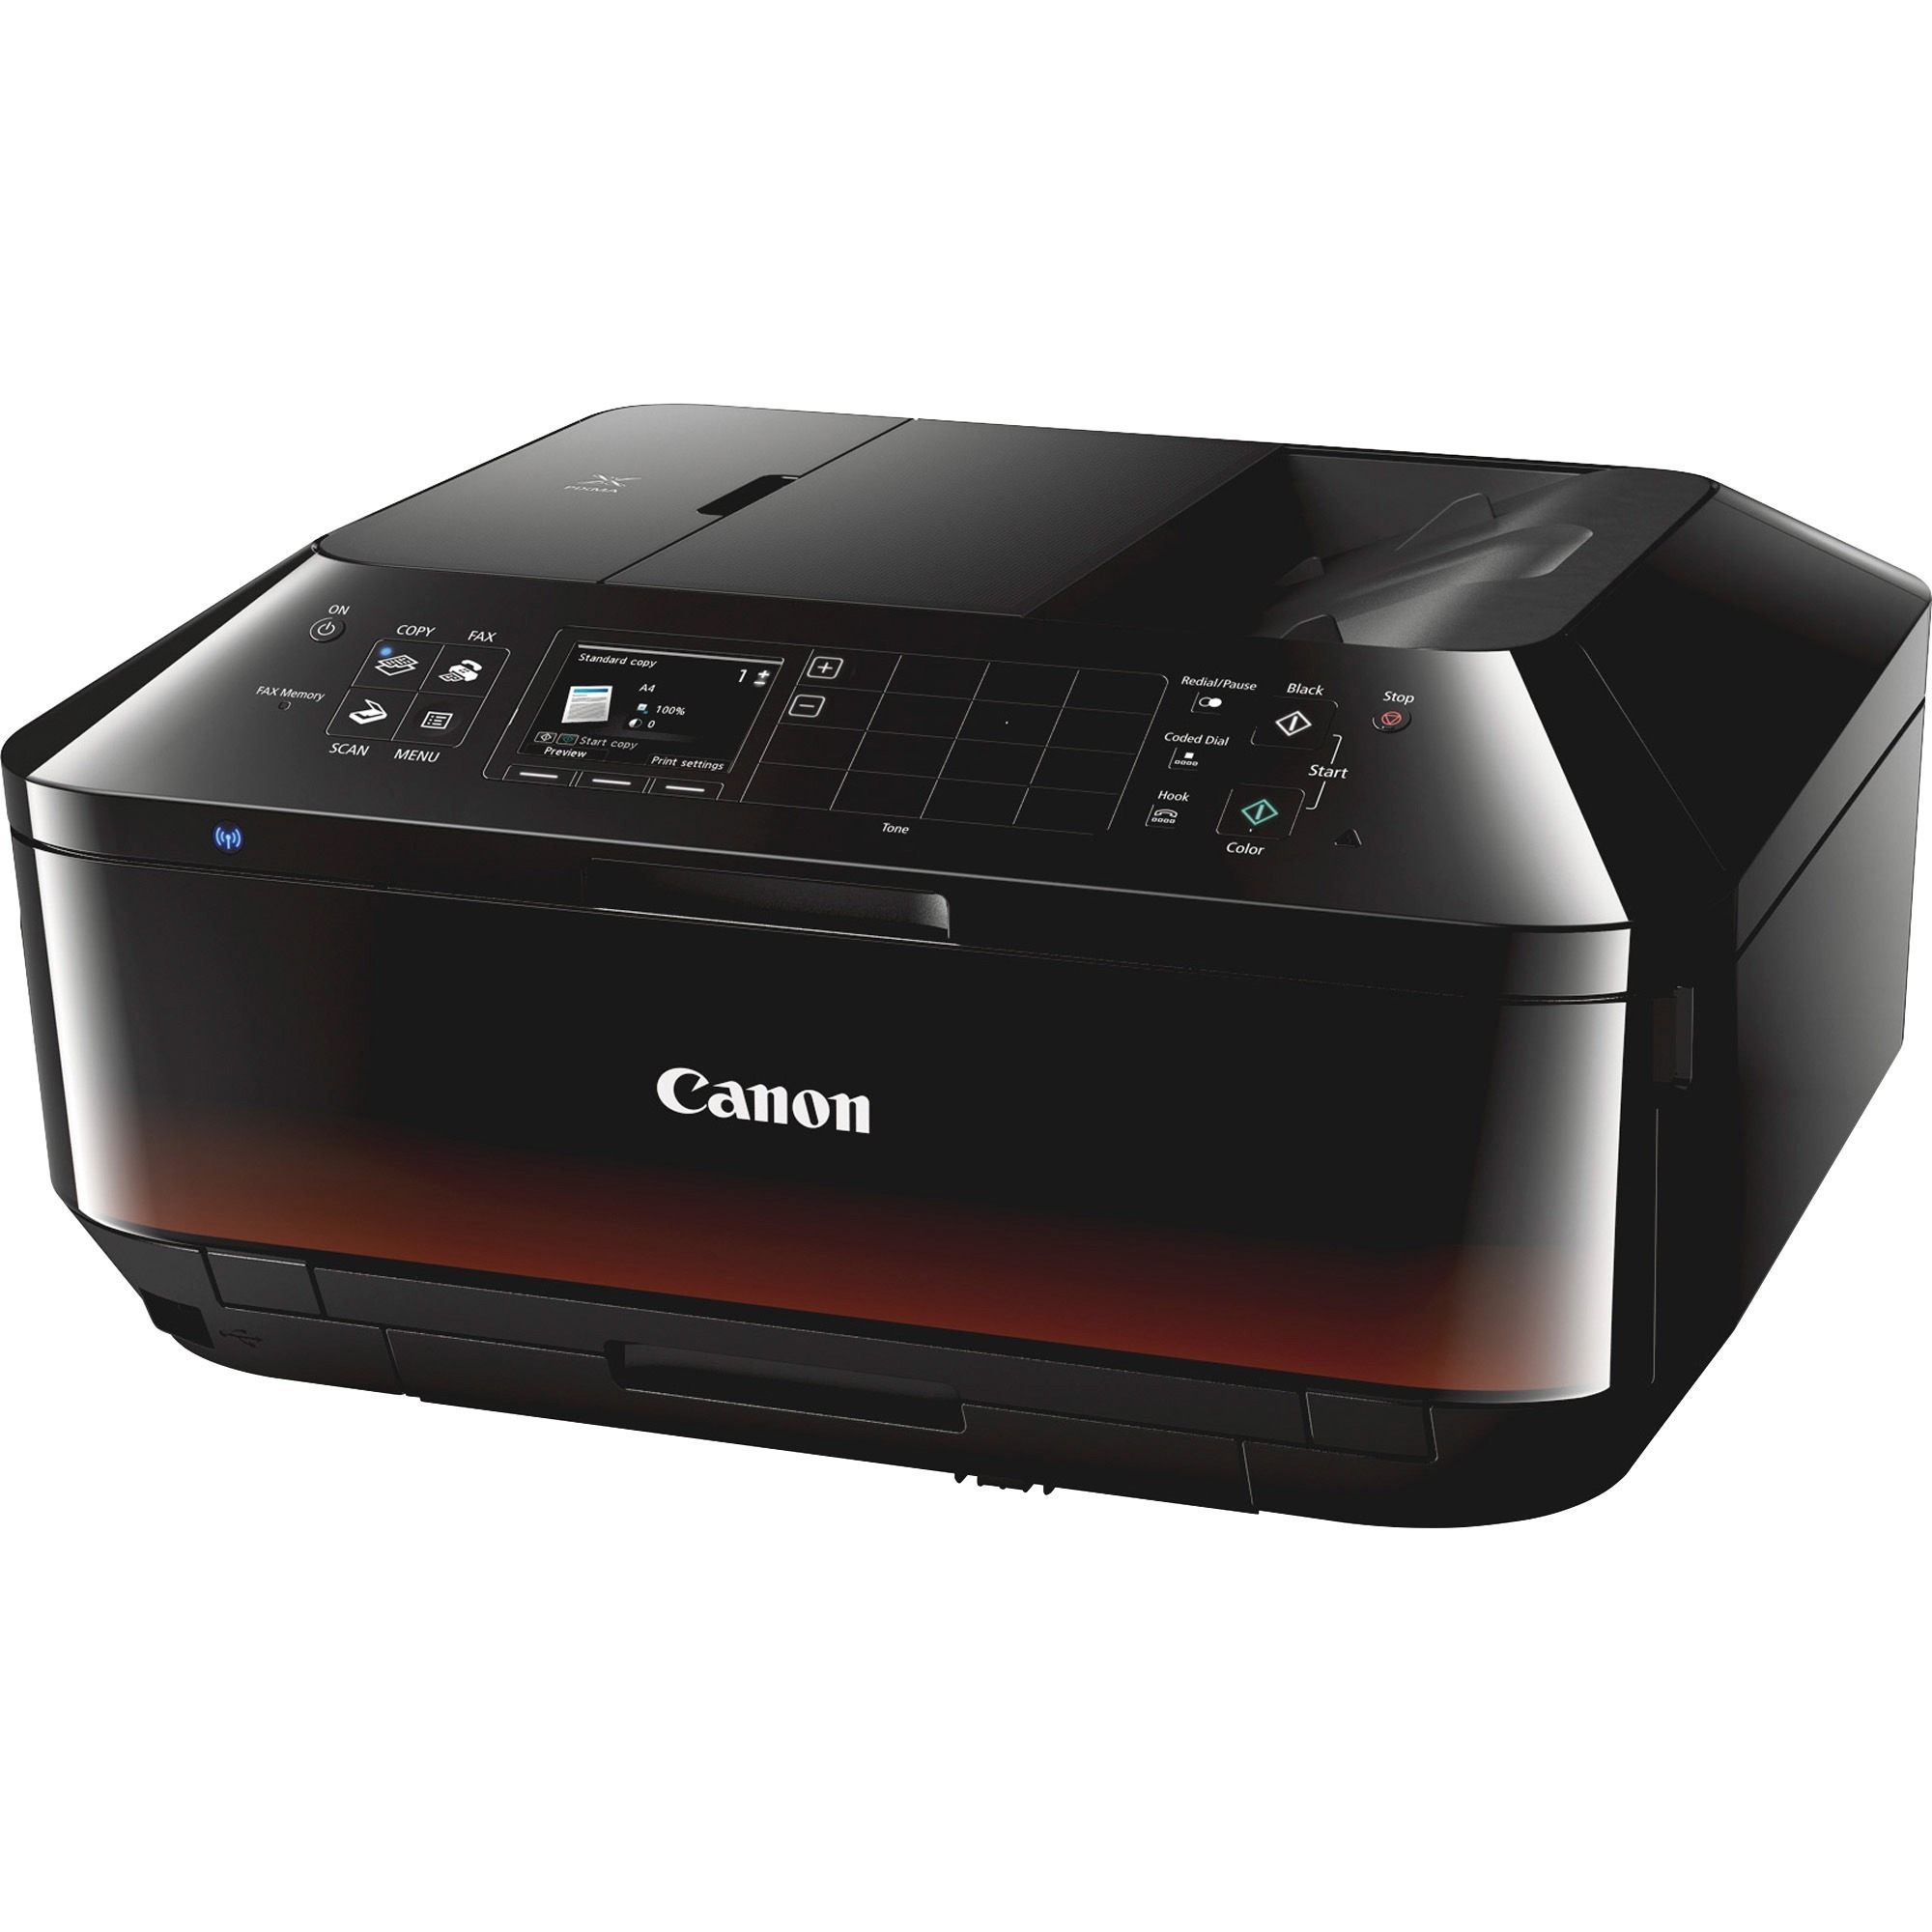 CNMMX922 Canon PIXMA MX922 Inkjet Multifunction Printer ...